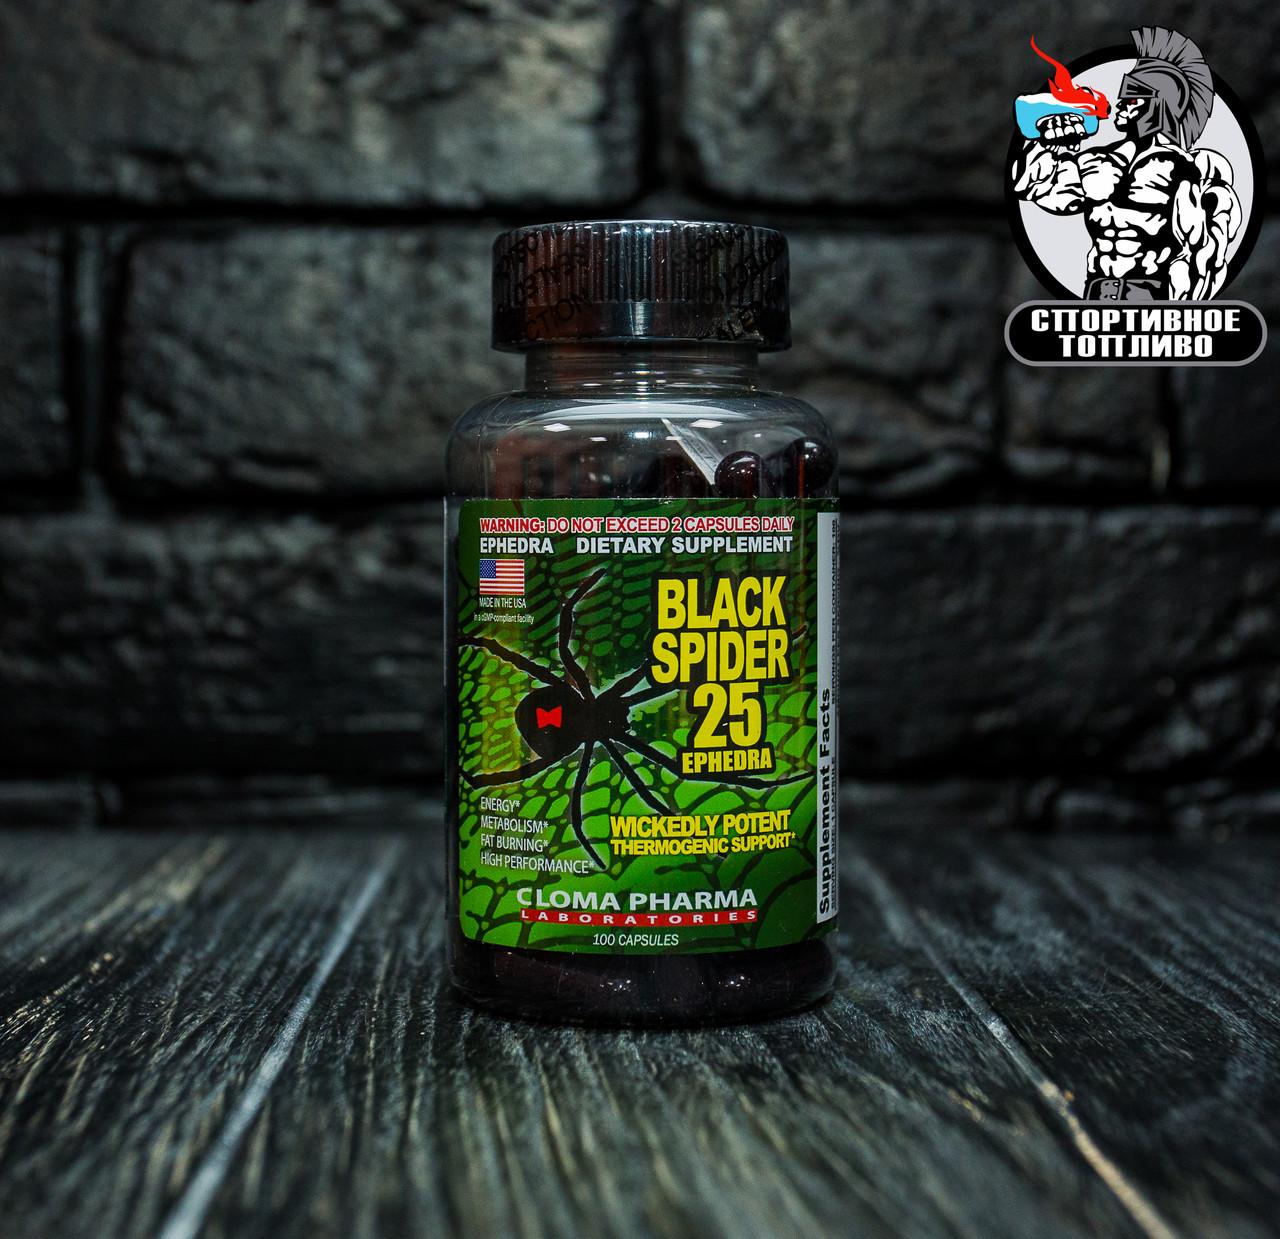 "Жиросжигатель - от Cloma Pharma ""Black Spider"" 25mg Eph (100 капс)"